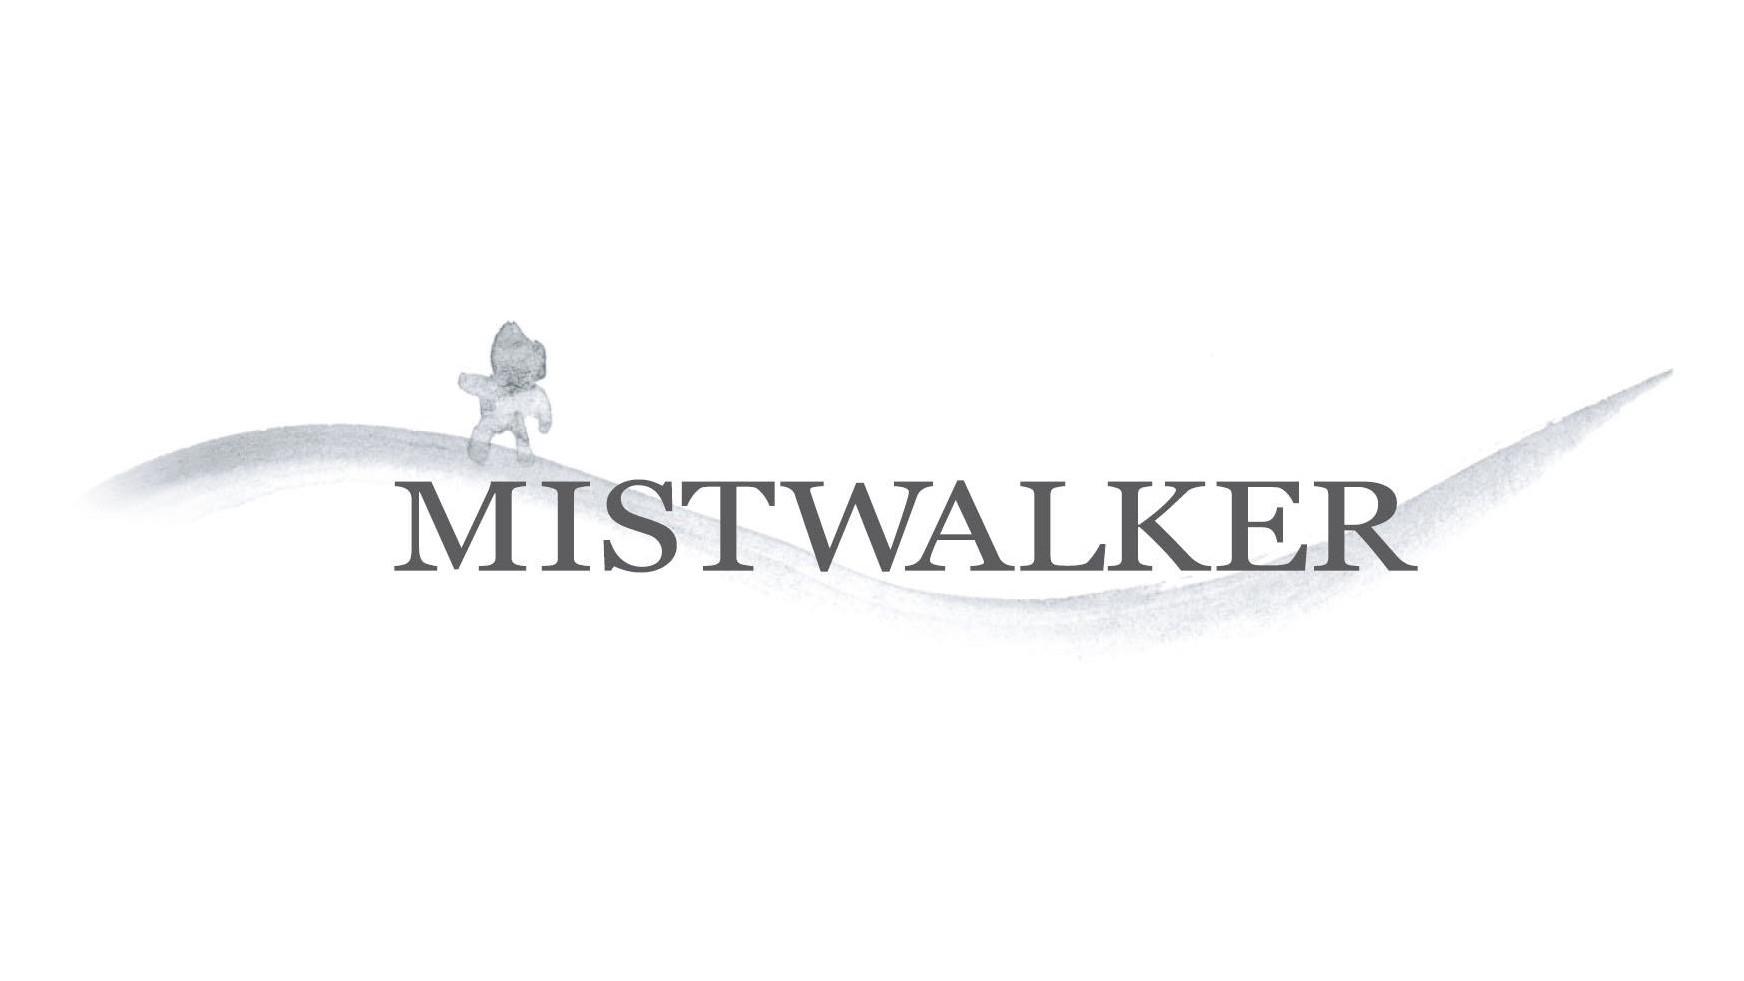 Lost Odyssey Amp Blue Dragon Dev Mistwalker Reveals Concept Art For Unannounced Title